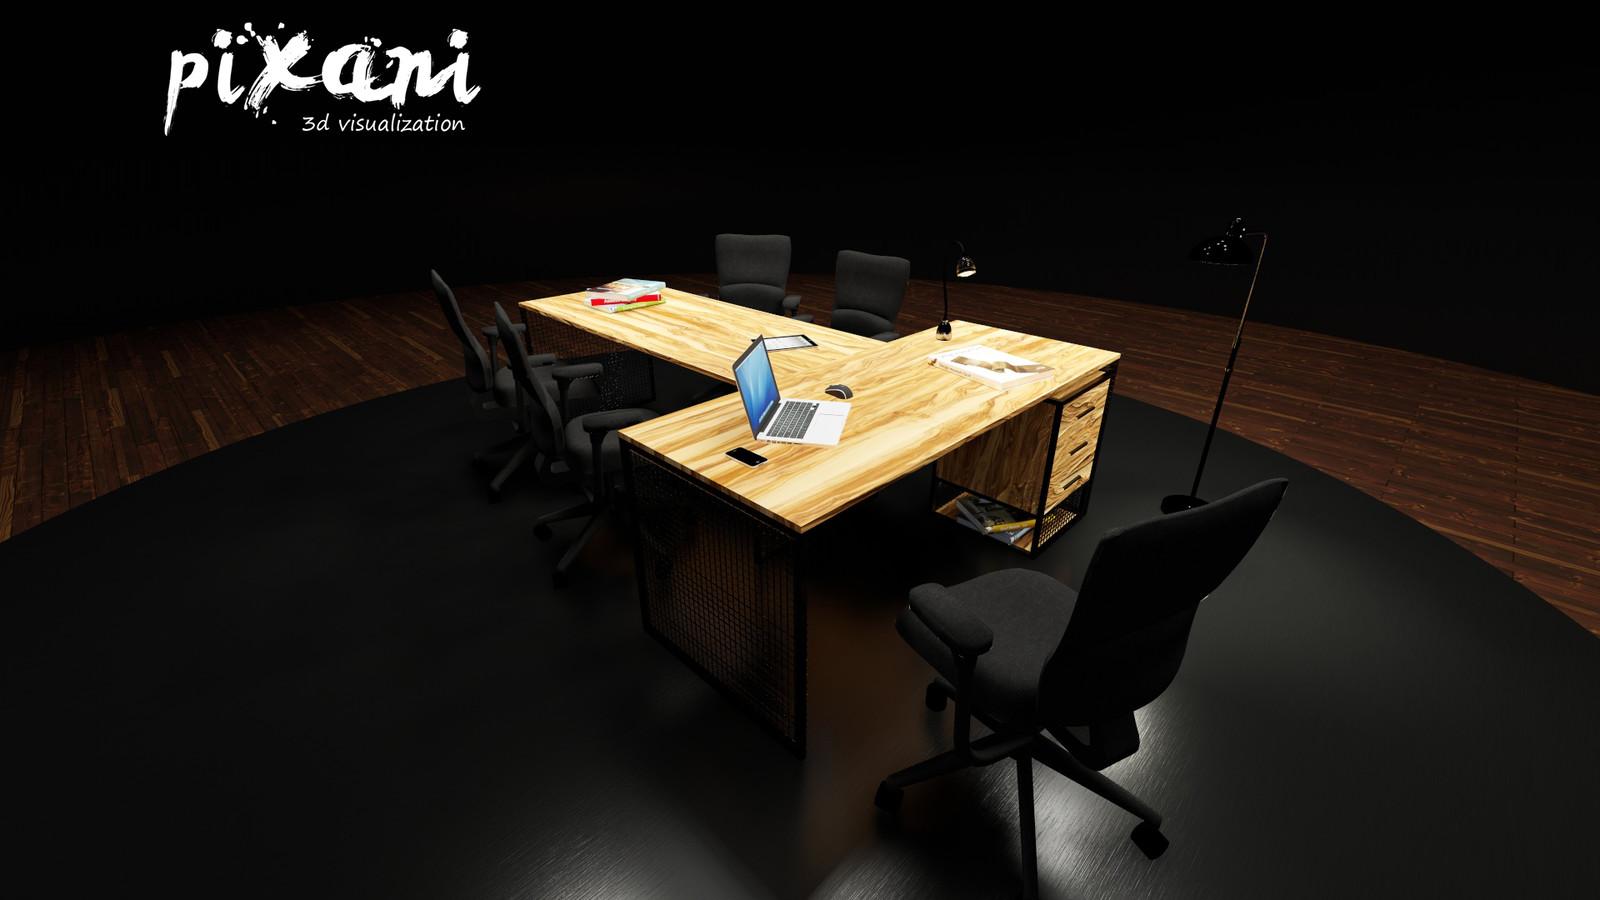 T-DESK gx      T-MASA gx  Furniture Designed by Serdar Çakmak designed for Limon Souvenir Shop  produced at Rival Reklam  P I X A N I #pixani #pixanirenders